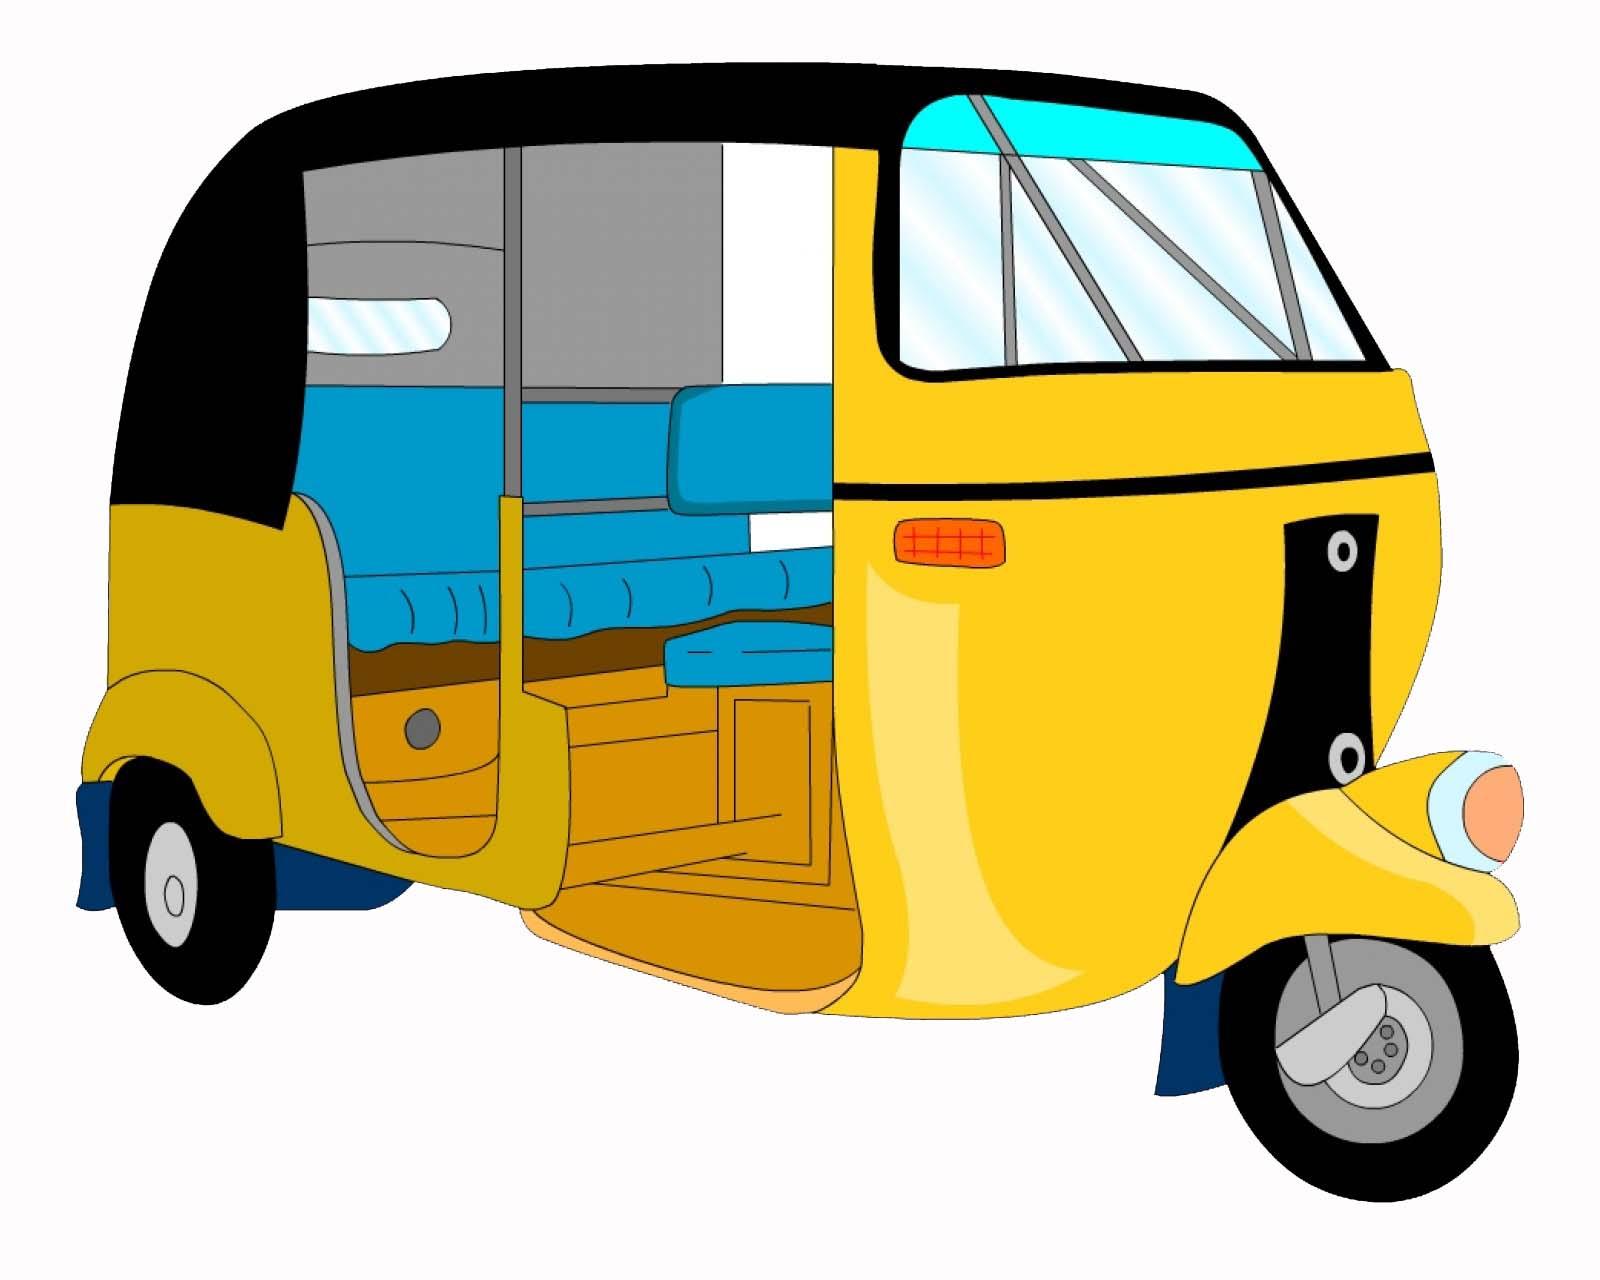 Auto rickshaw cartoon clipart picture royalty free library Auto Cartoon Free Download Clip Art - WebComicms.Net picture royalty free library